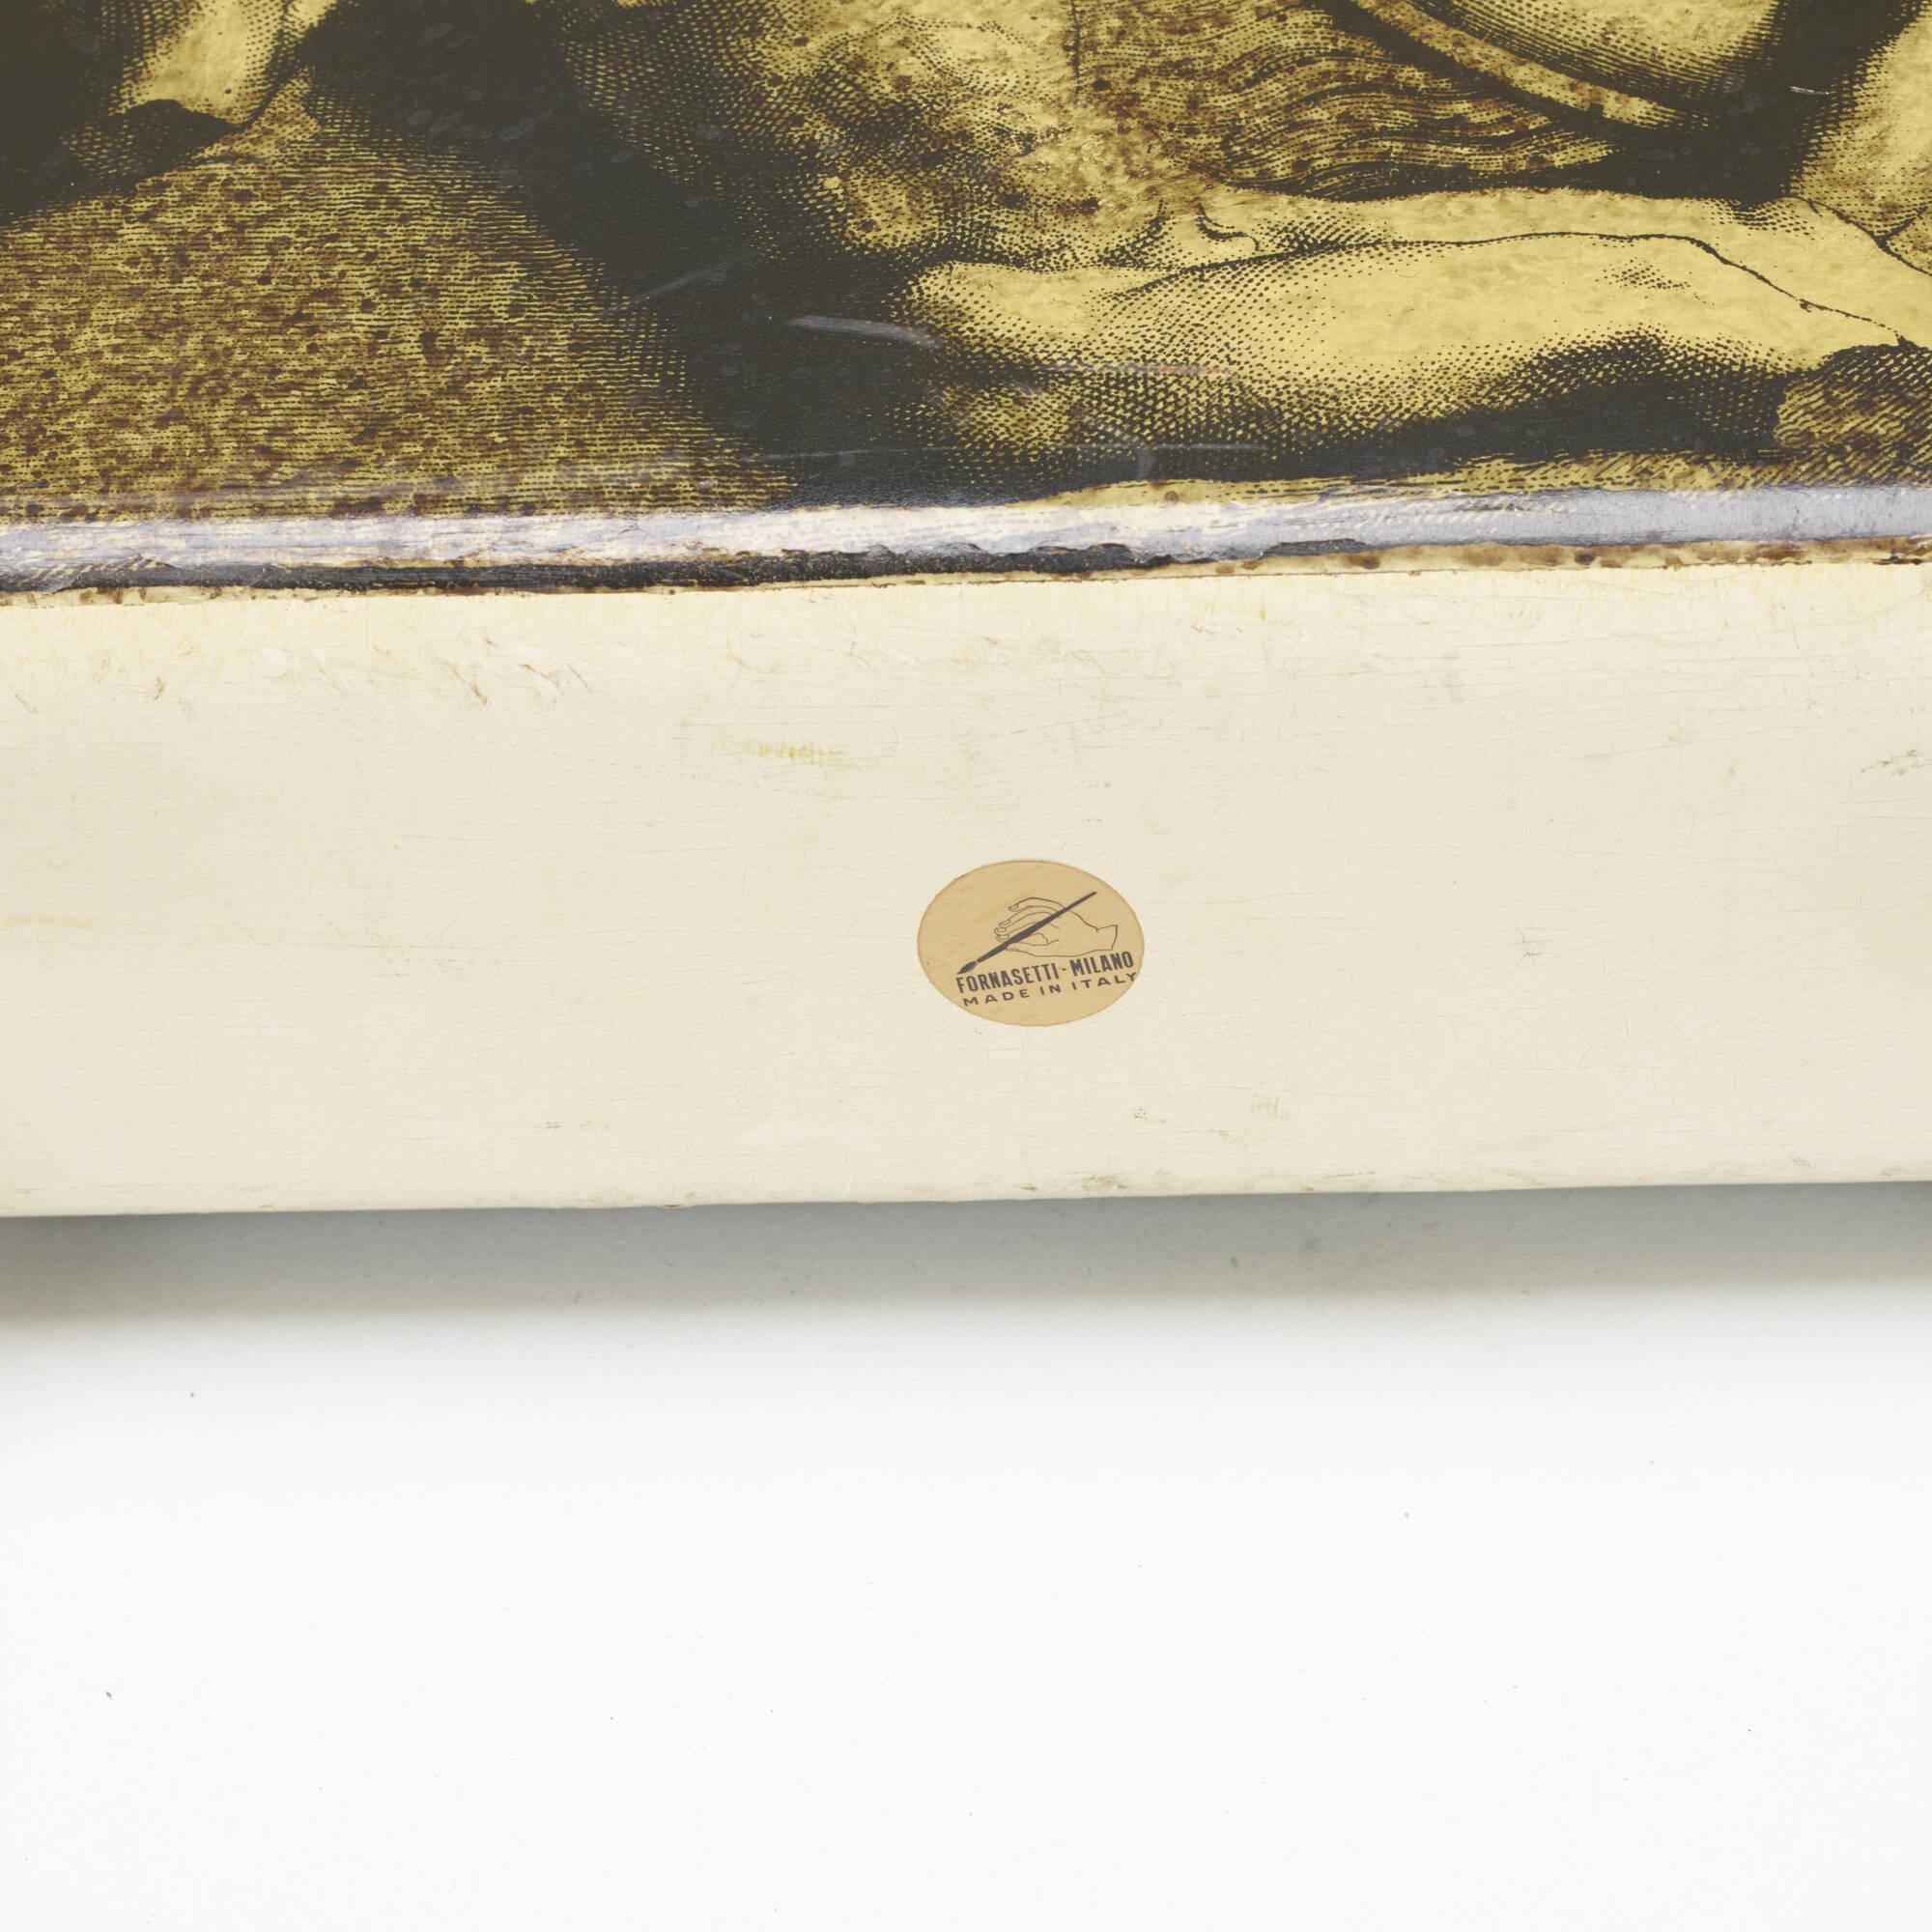 387: Piero Fornasetti / Bassorilievo magazine rack (3 of 3)